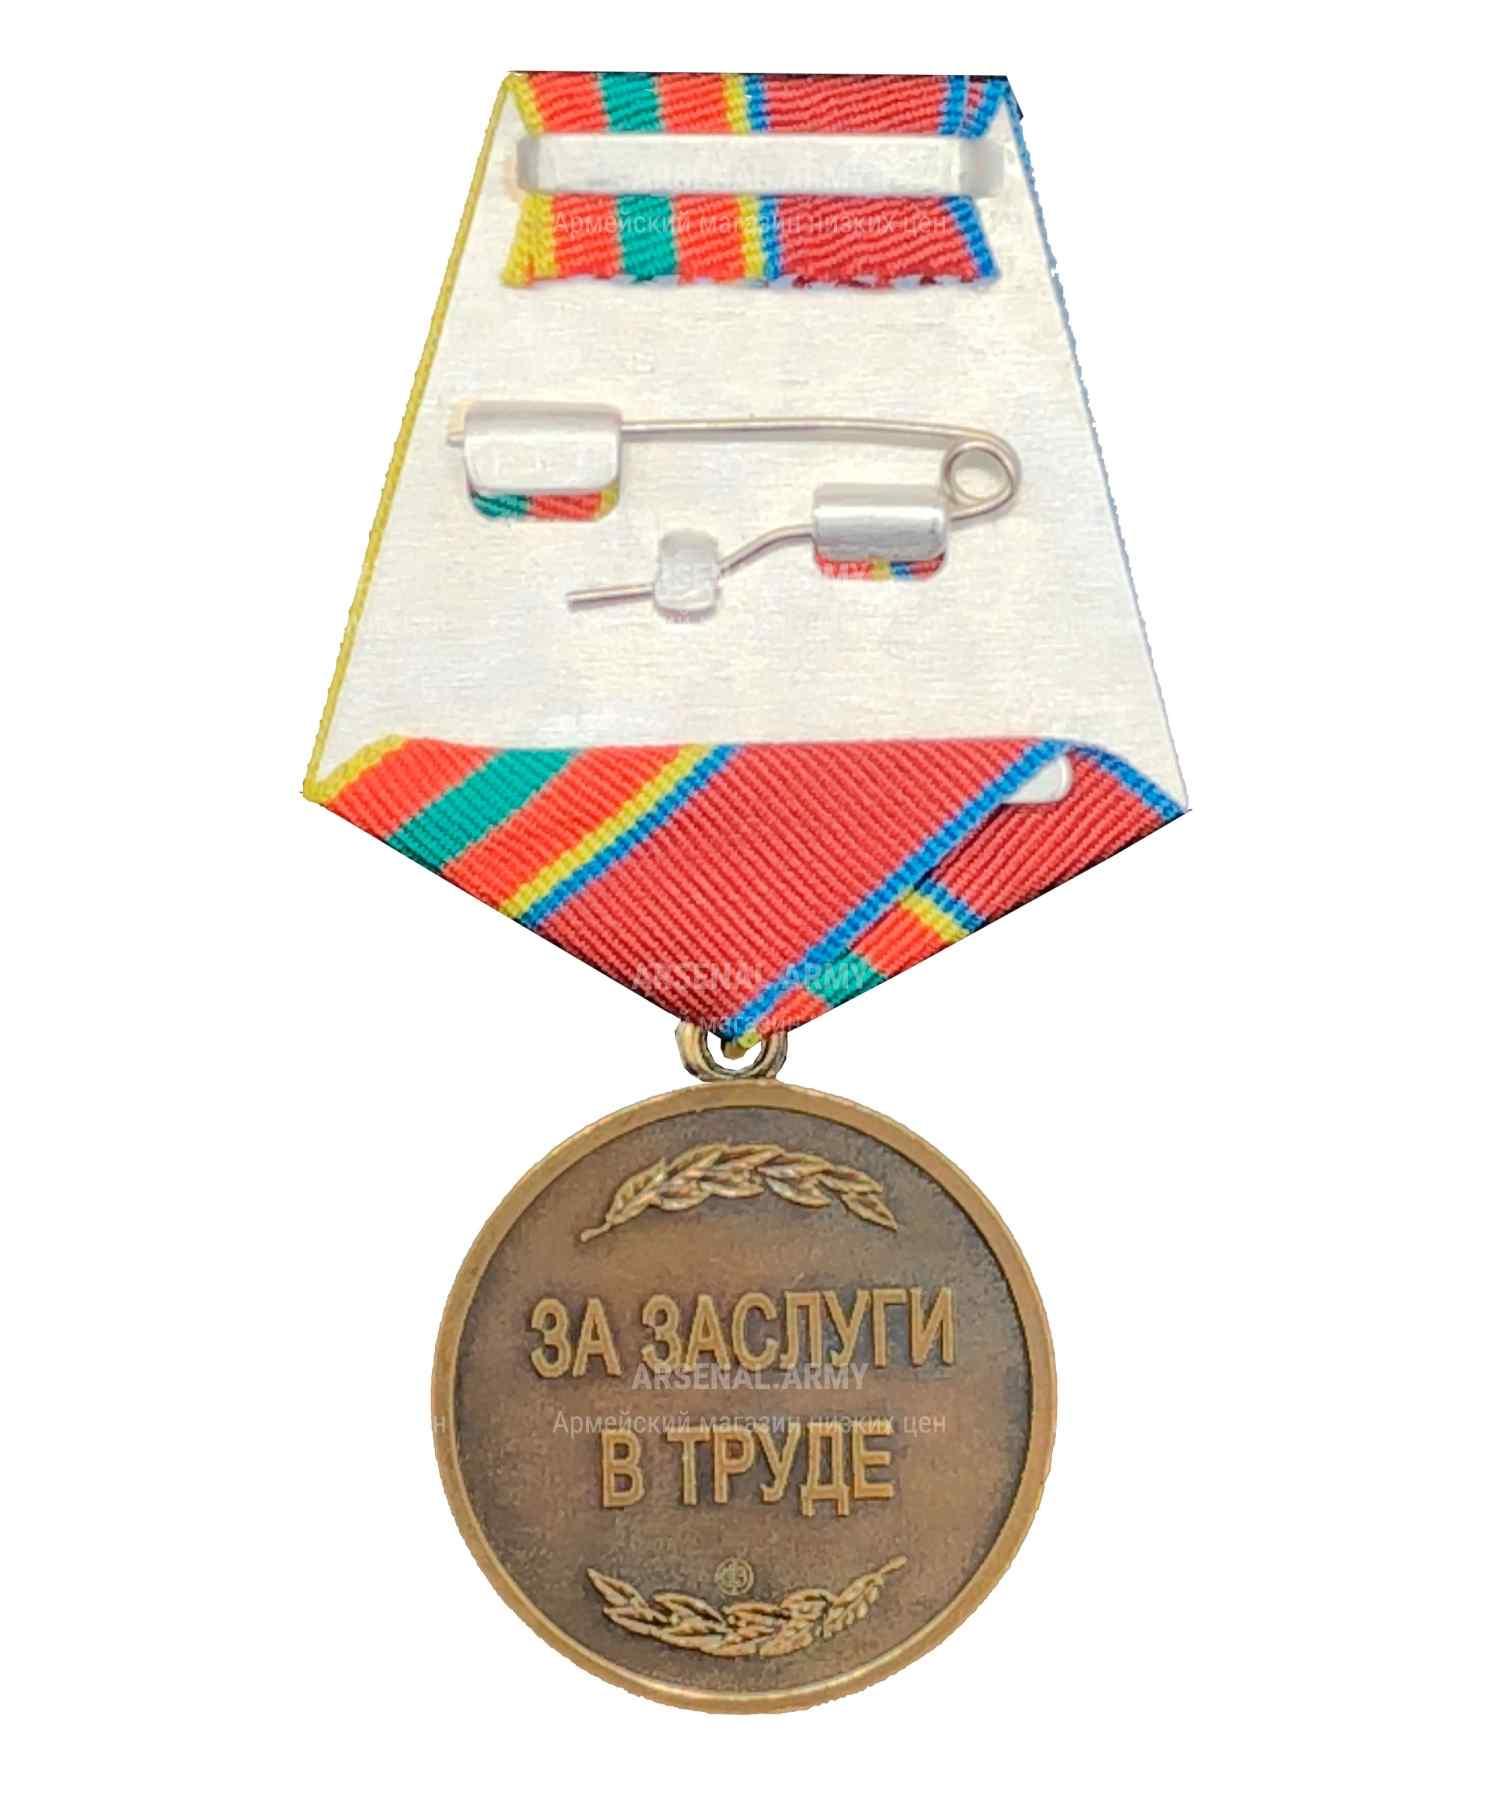 "Медаль Росгвардии ""За заслуги в труде"""